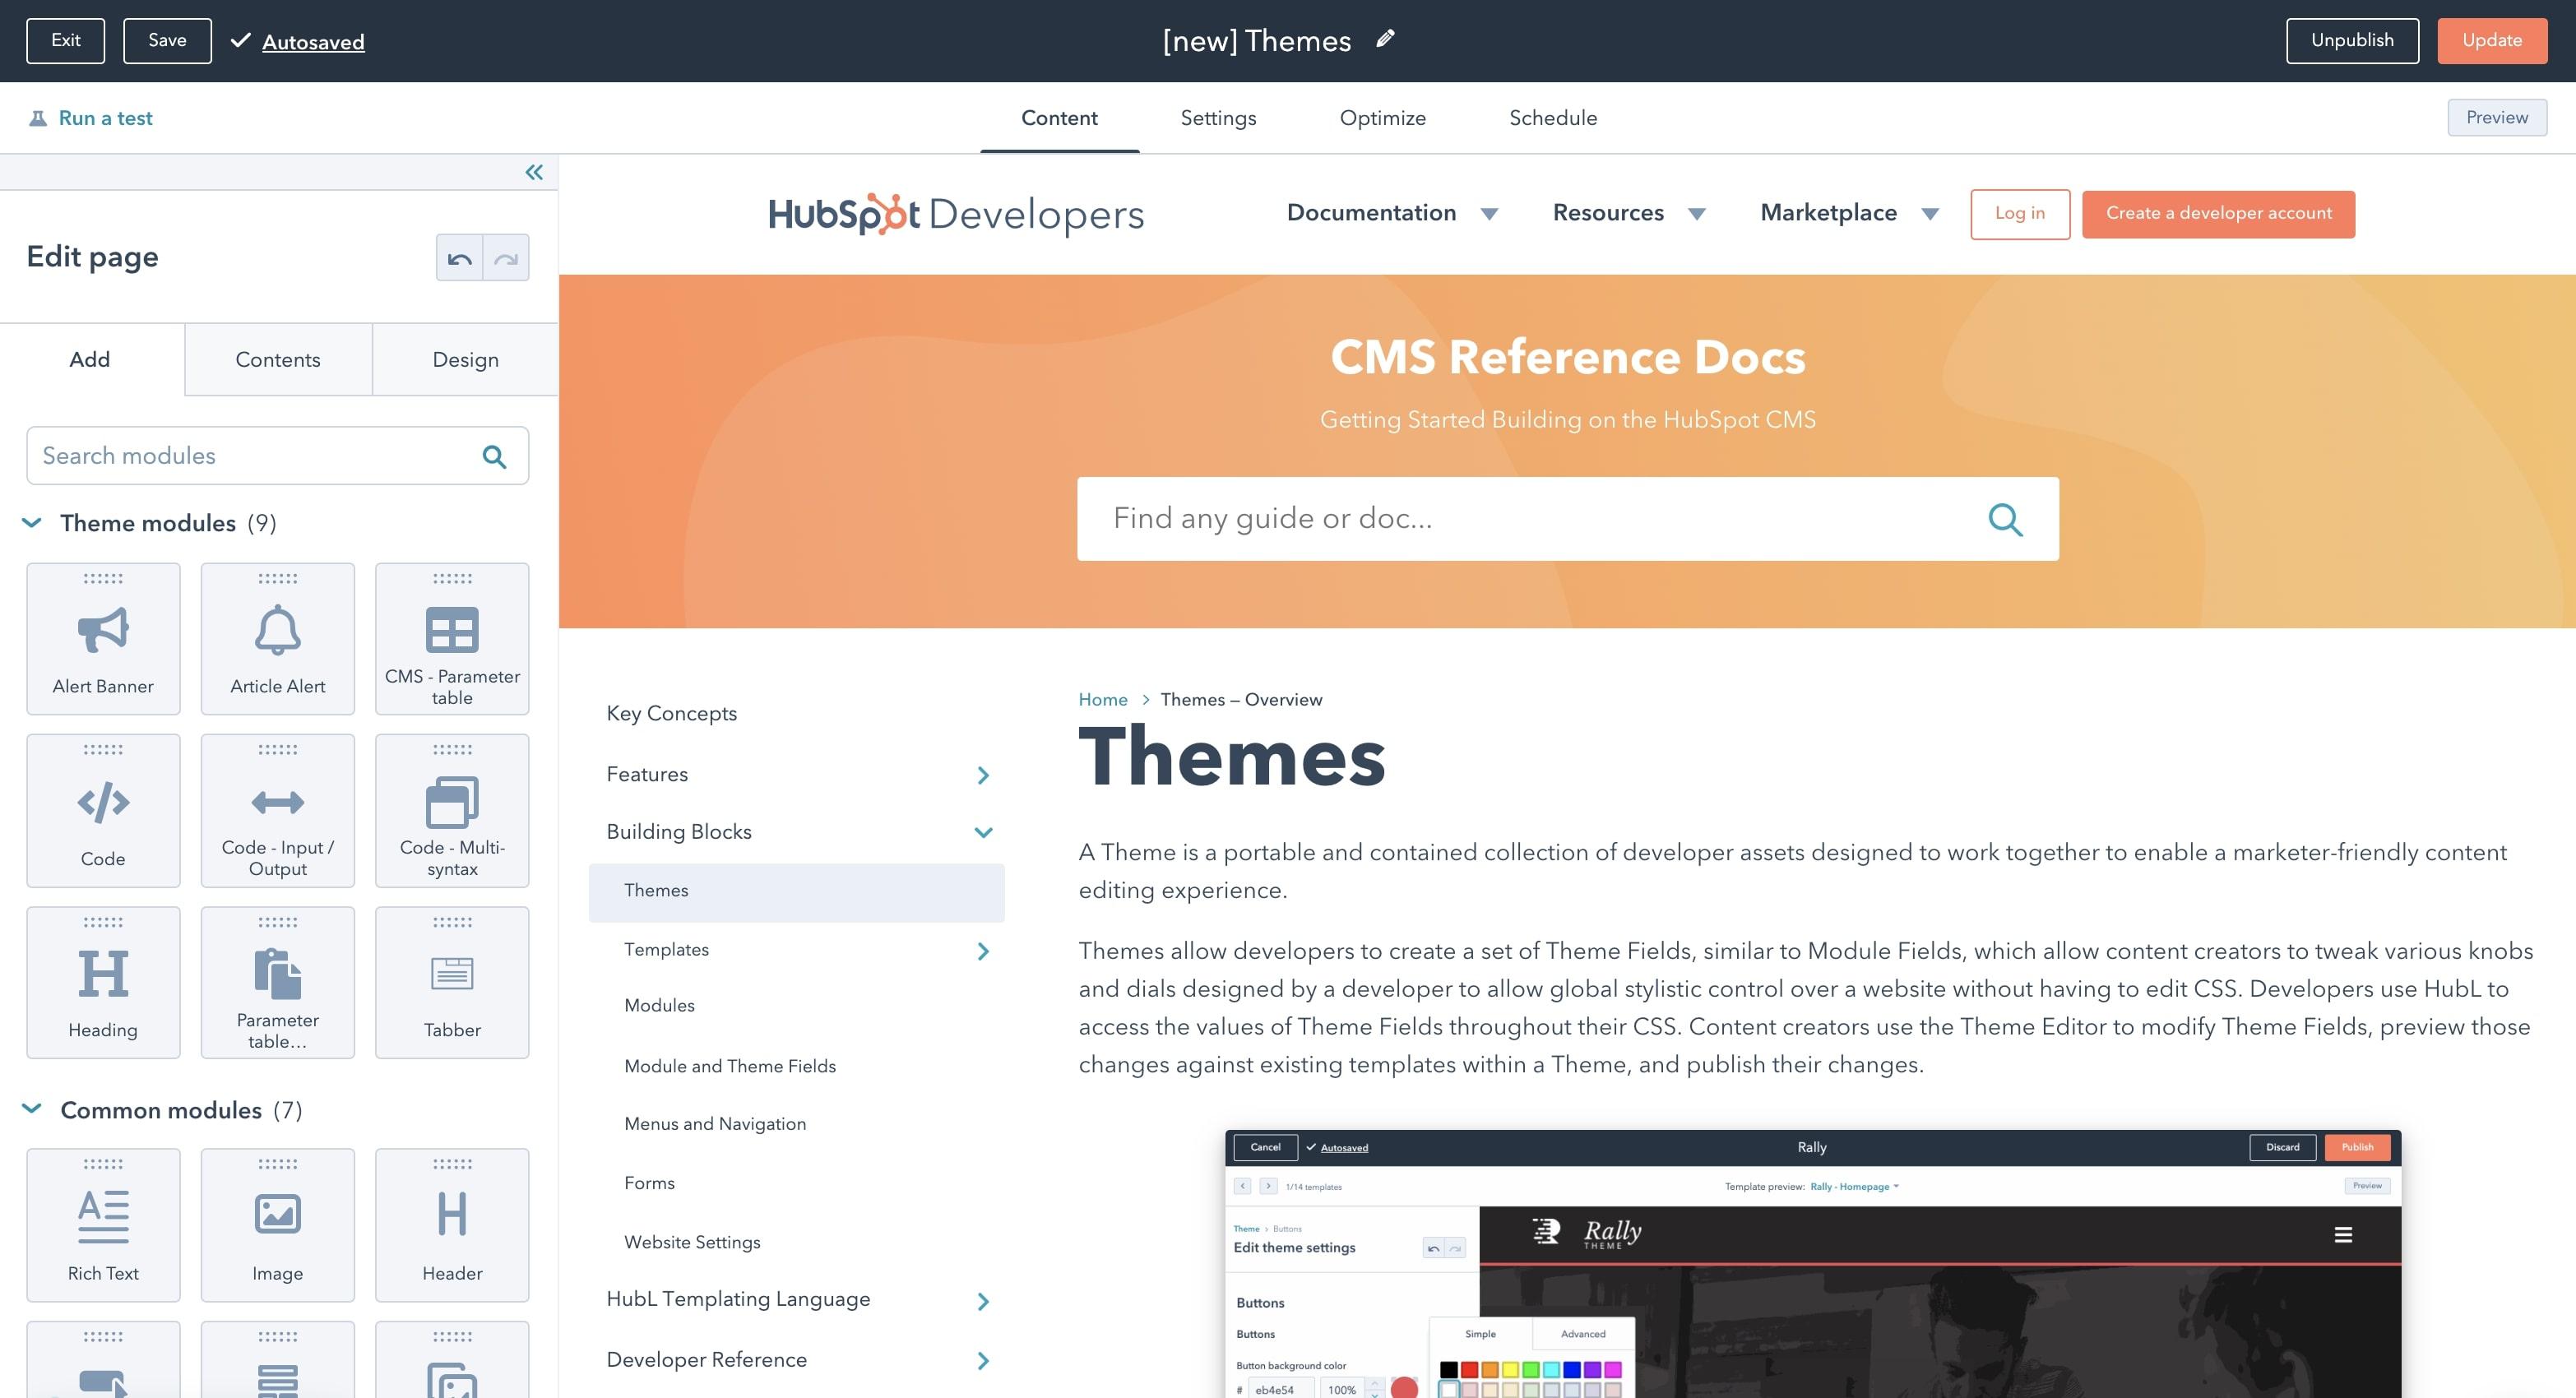 theme modules